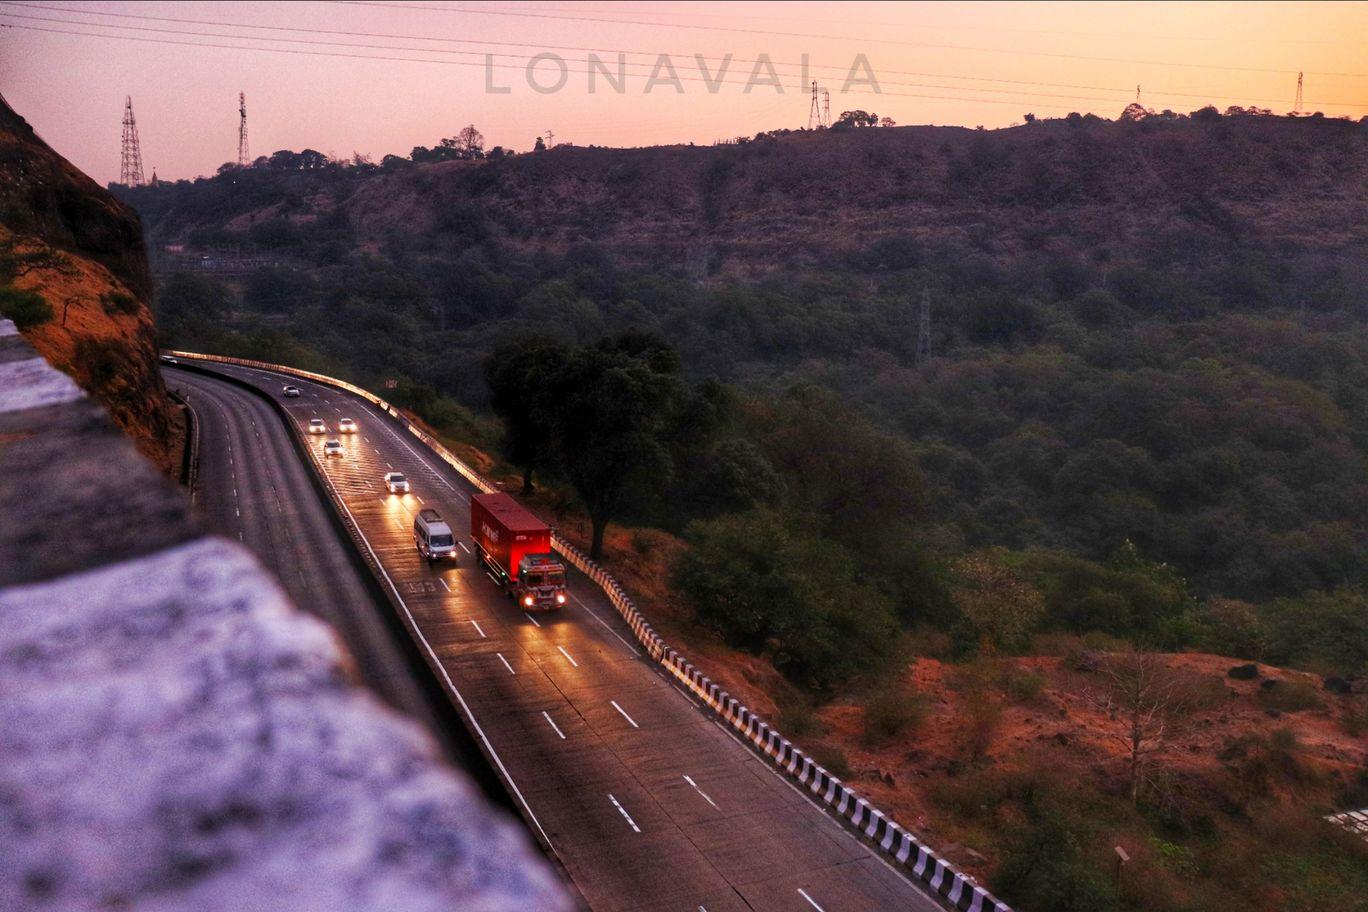 Photo of Lonavala By Arun Nair